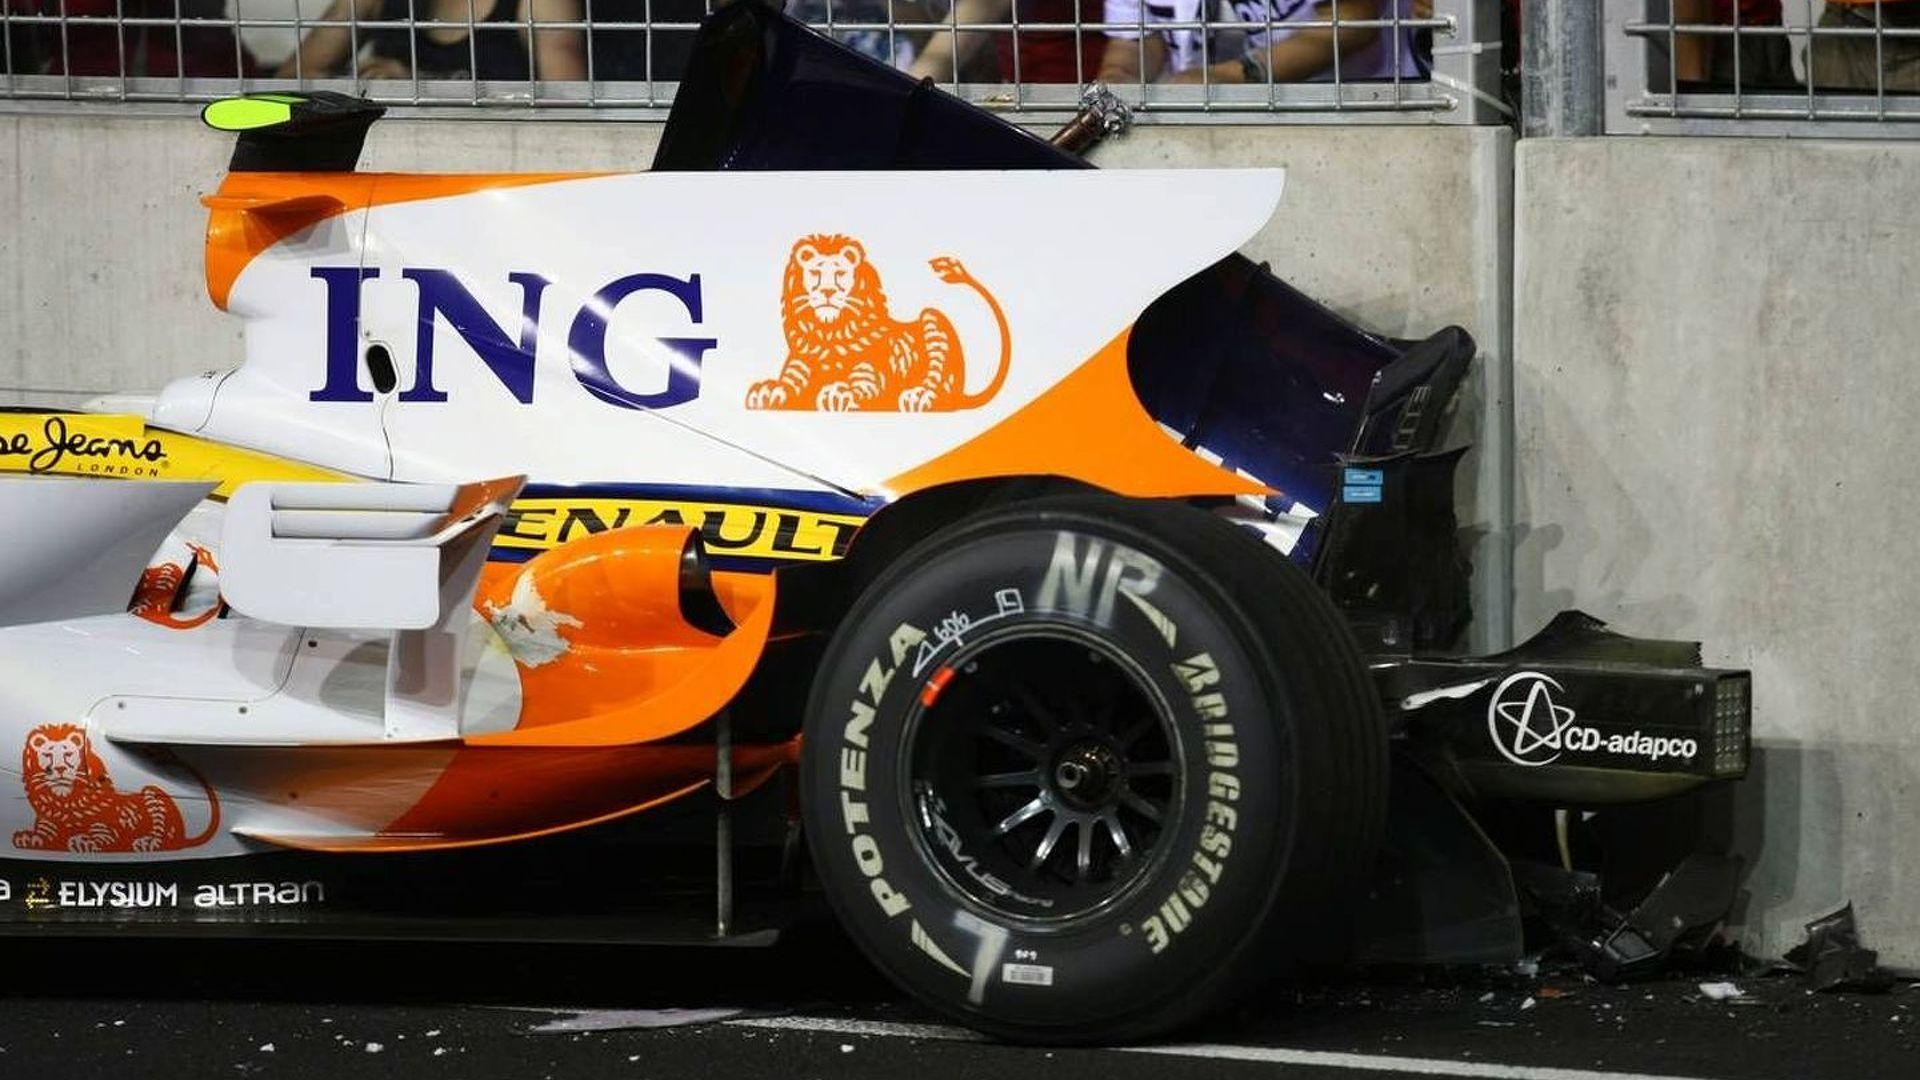 Piquet evidence leaks 'serious' - FIA